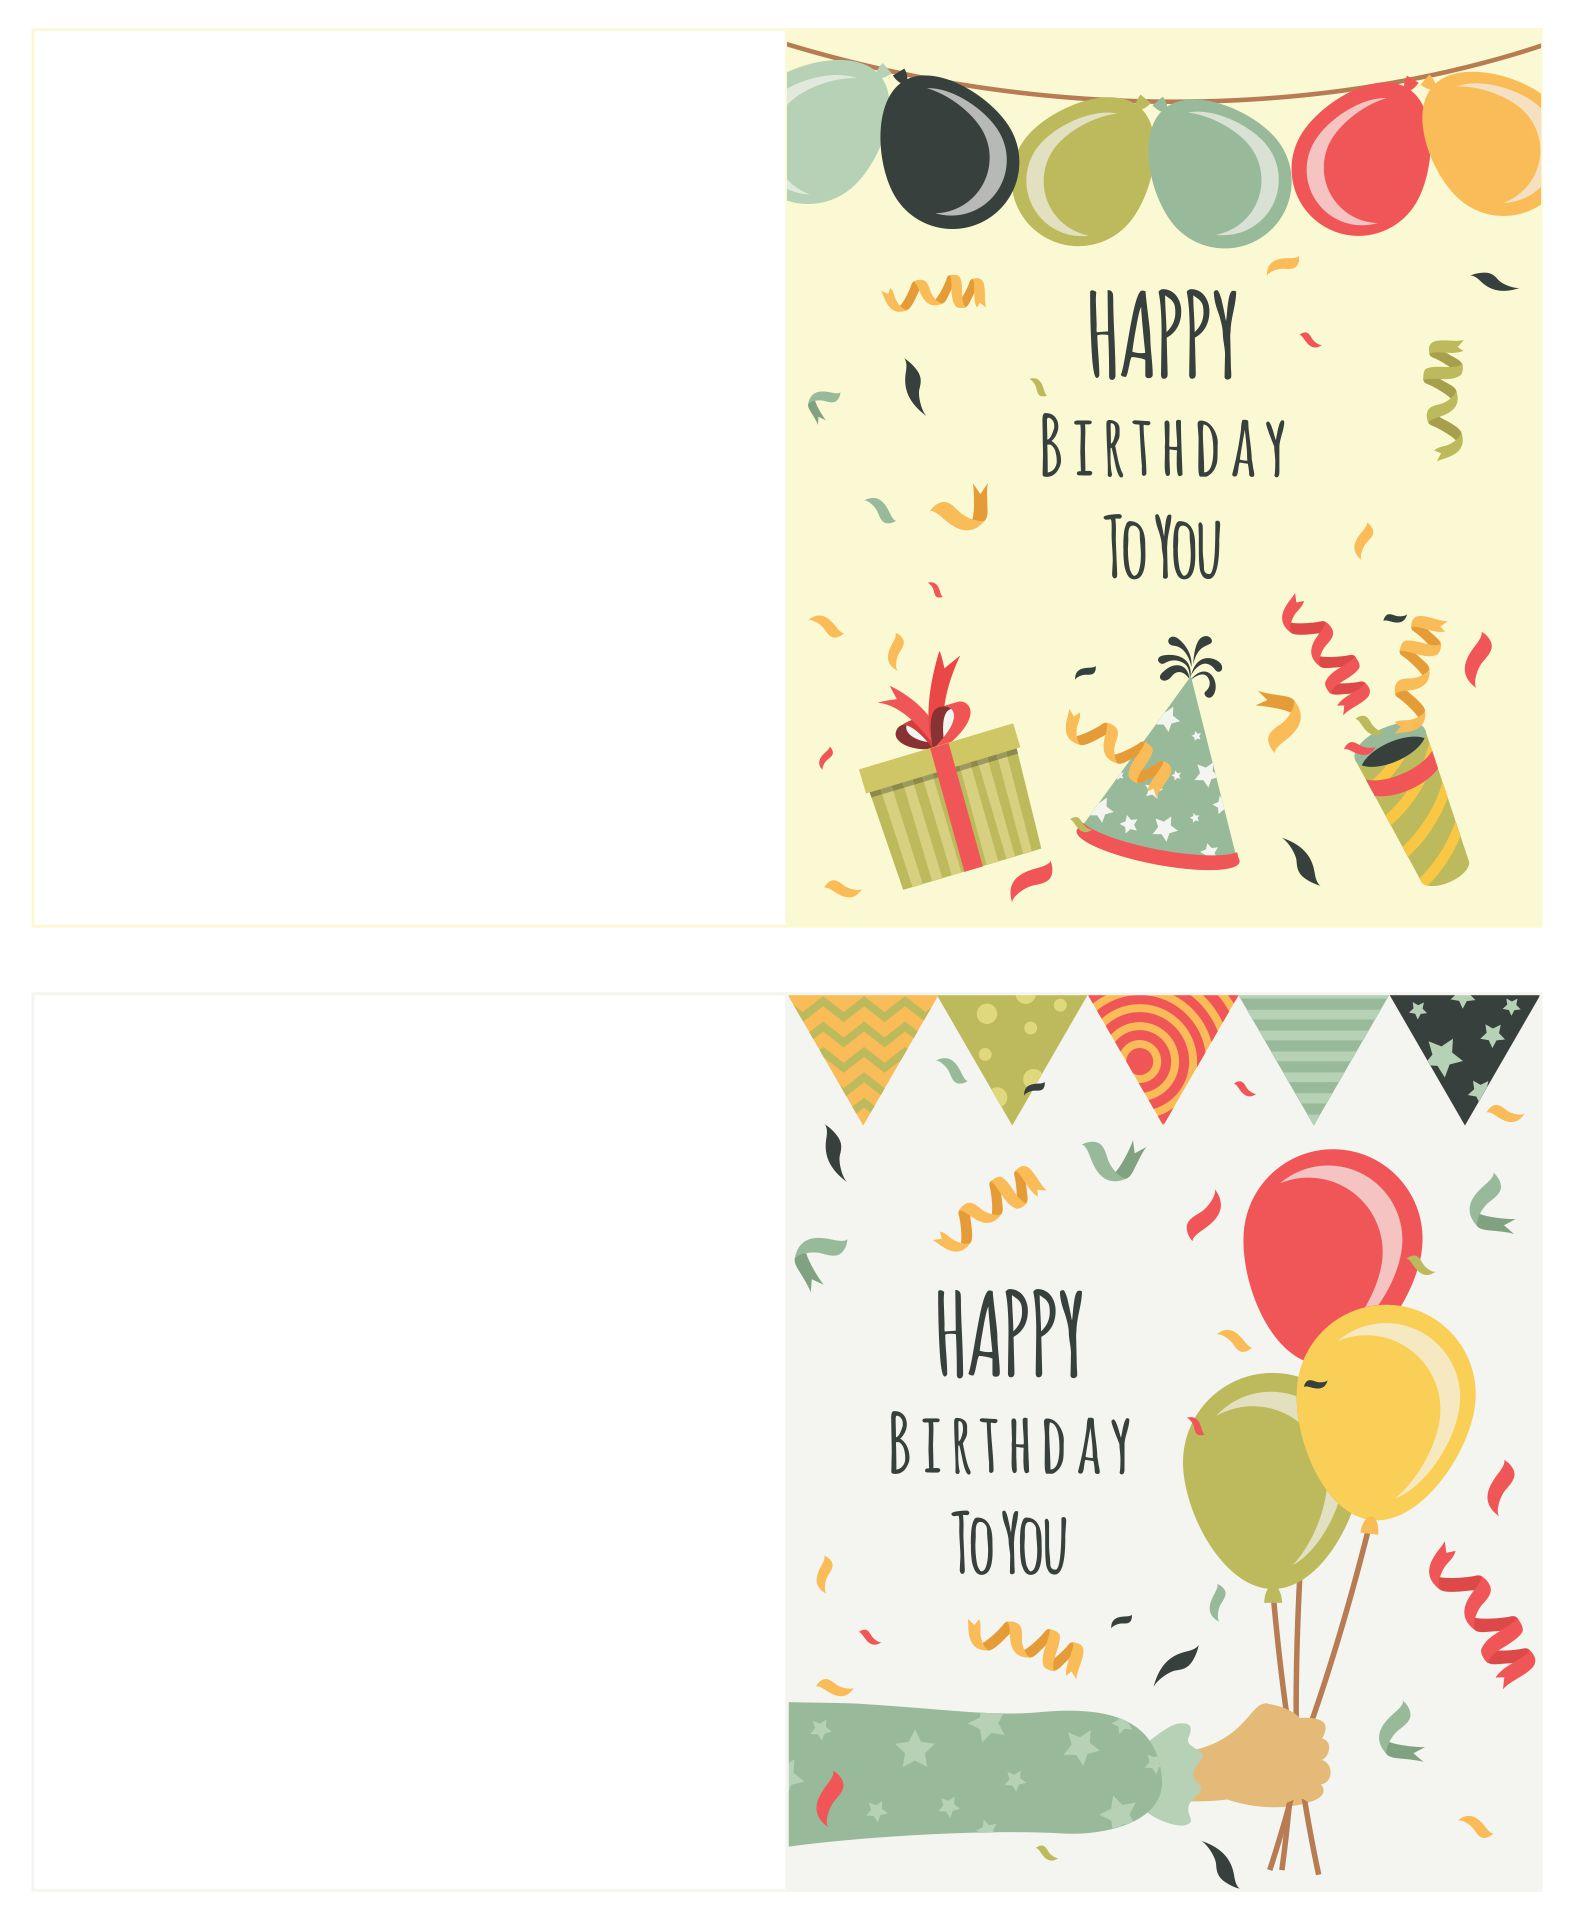 Printable Foldable Birthday Cards To Print